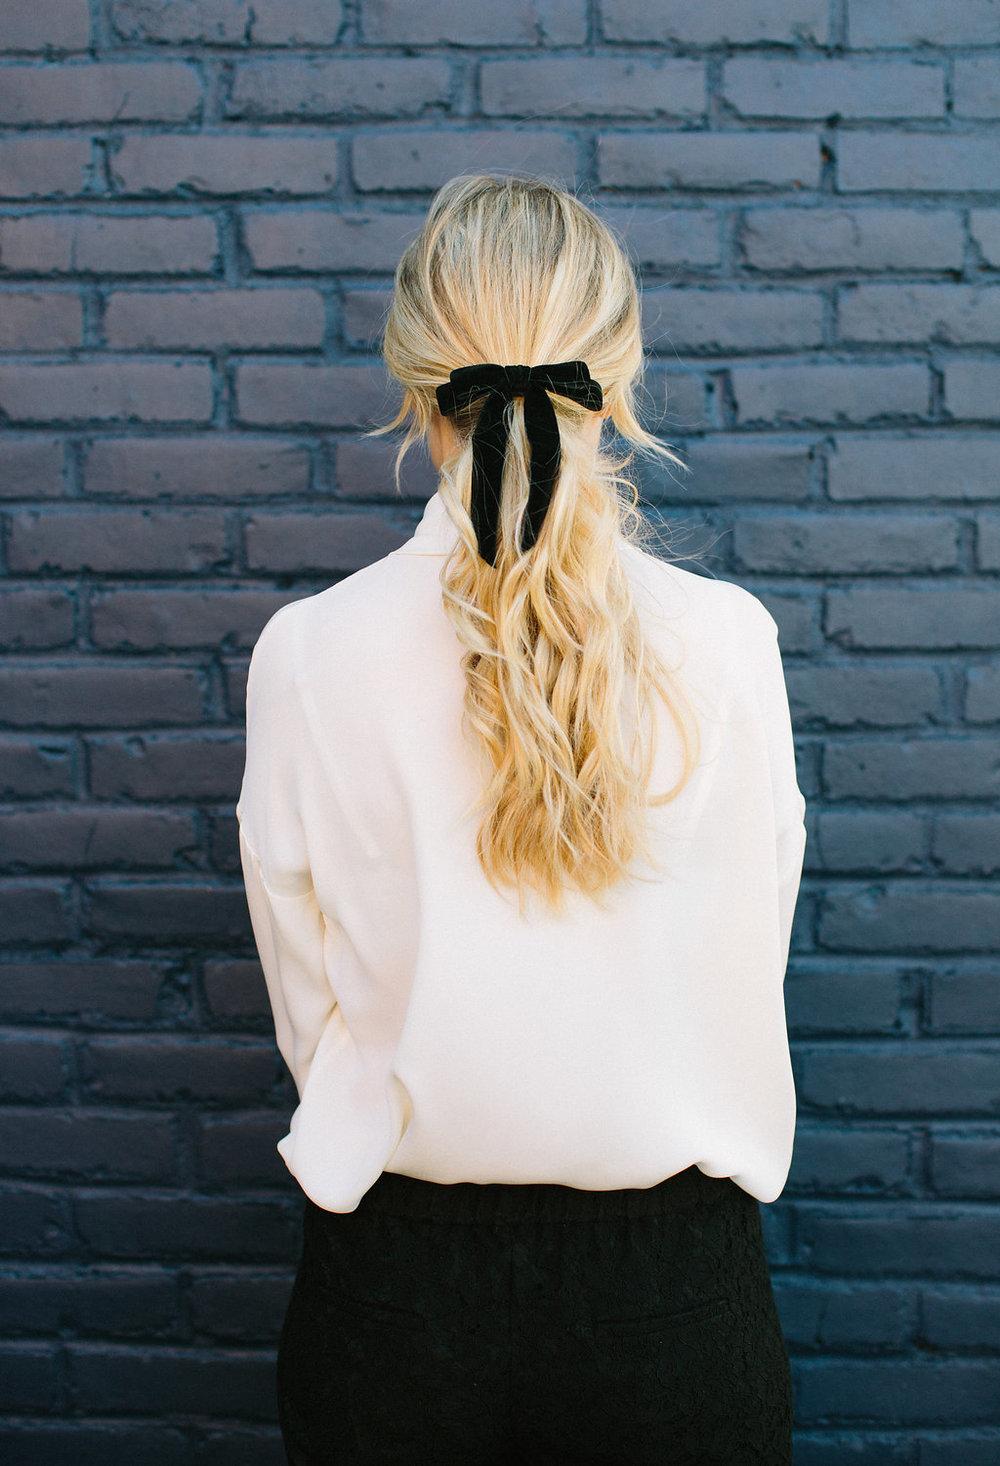 StephanieTrotta-TheGirlGuide-LindsayMaddenPhotography-8.jpg